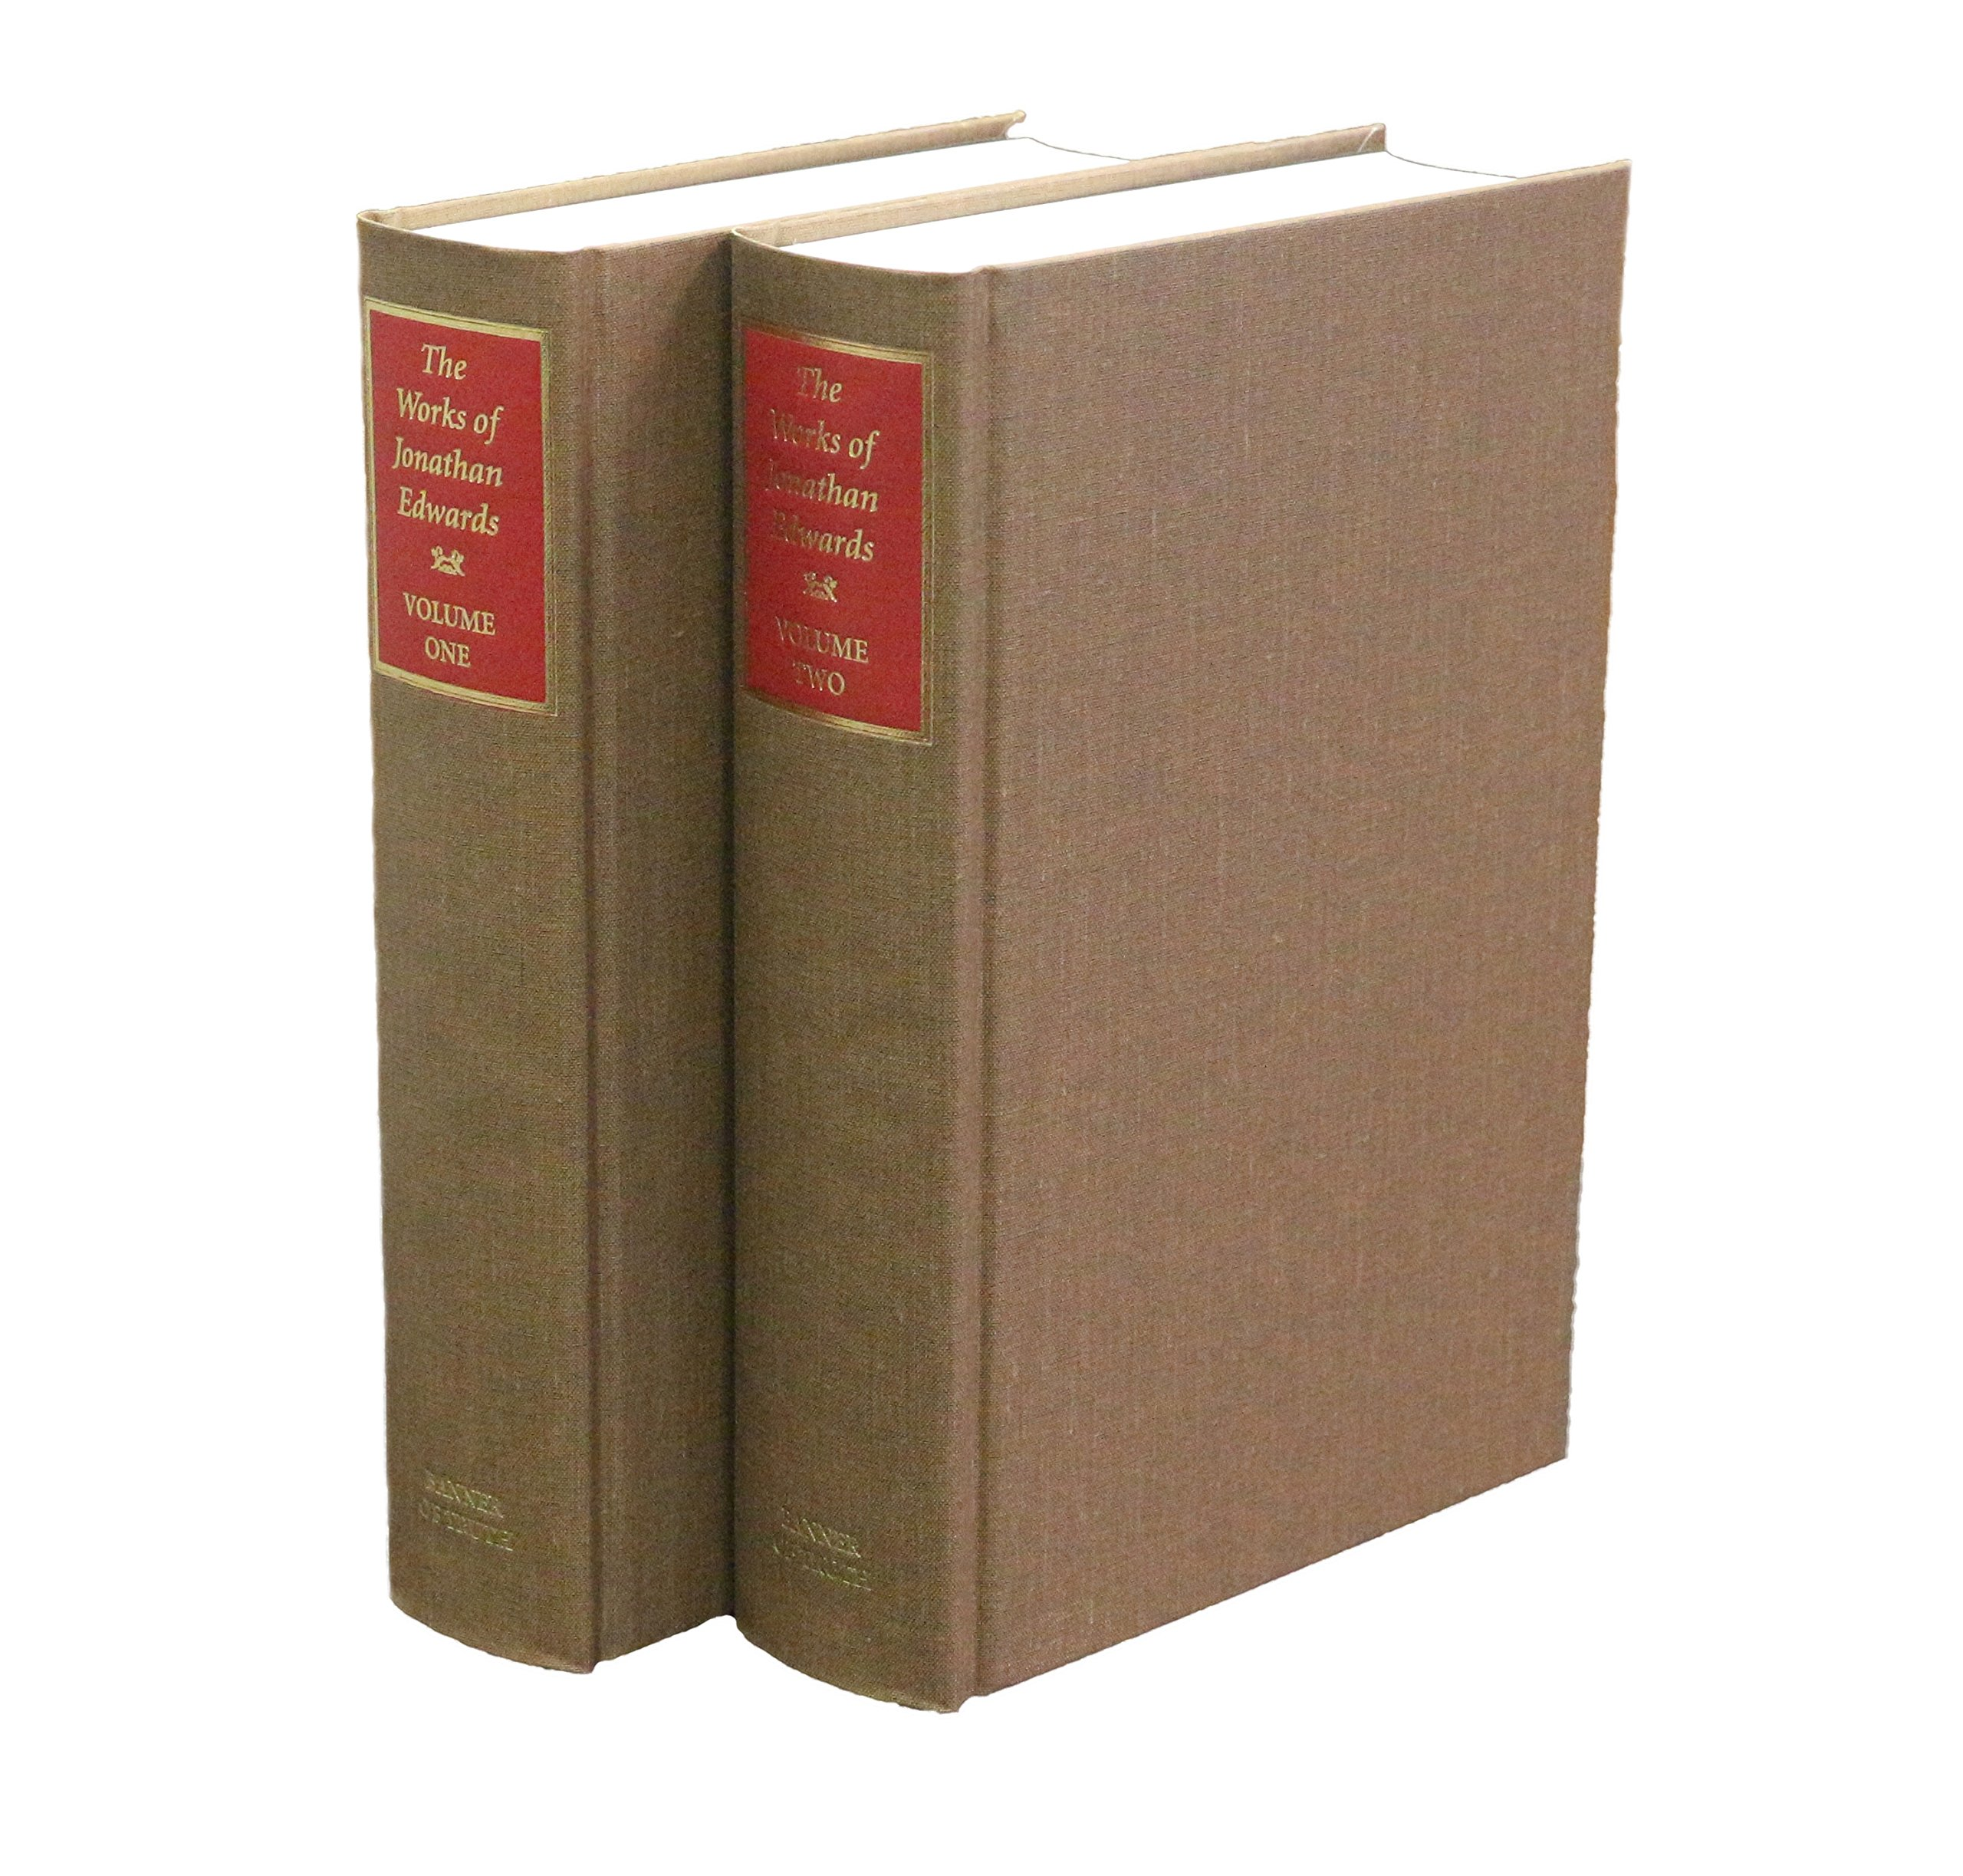 Works of Jonathan Edwards. 2 Volume Set (v. 1 & 2)